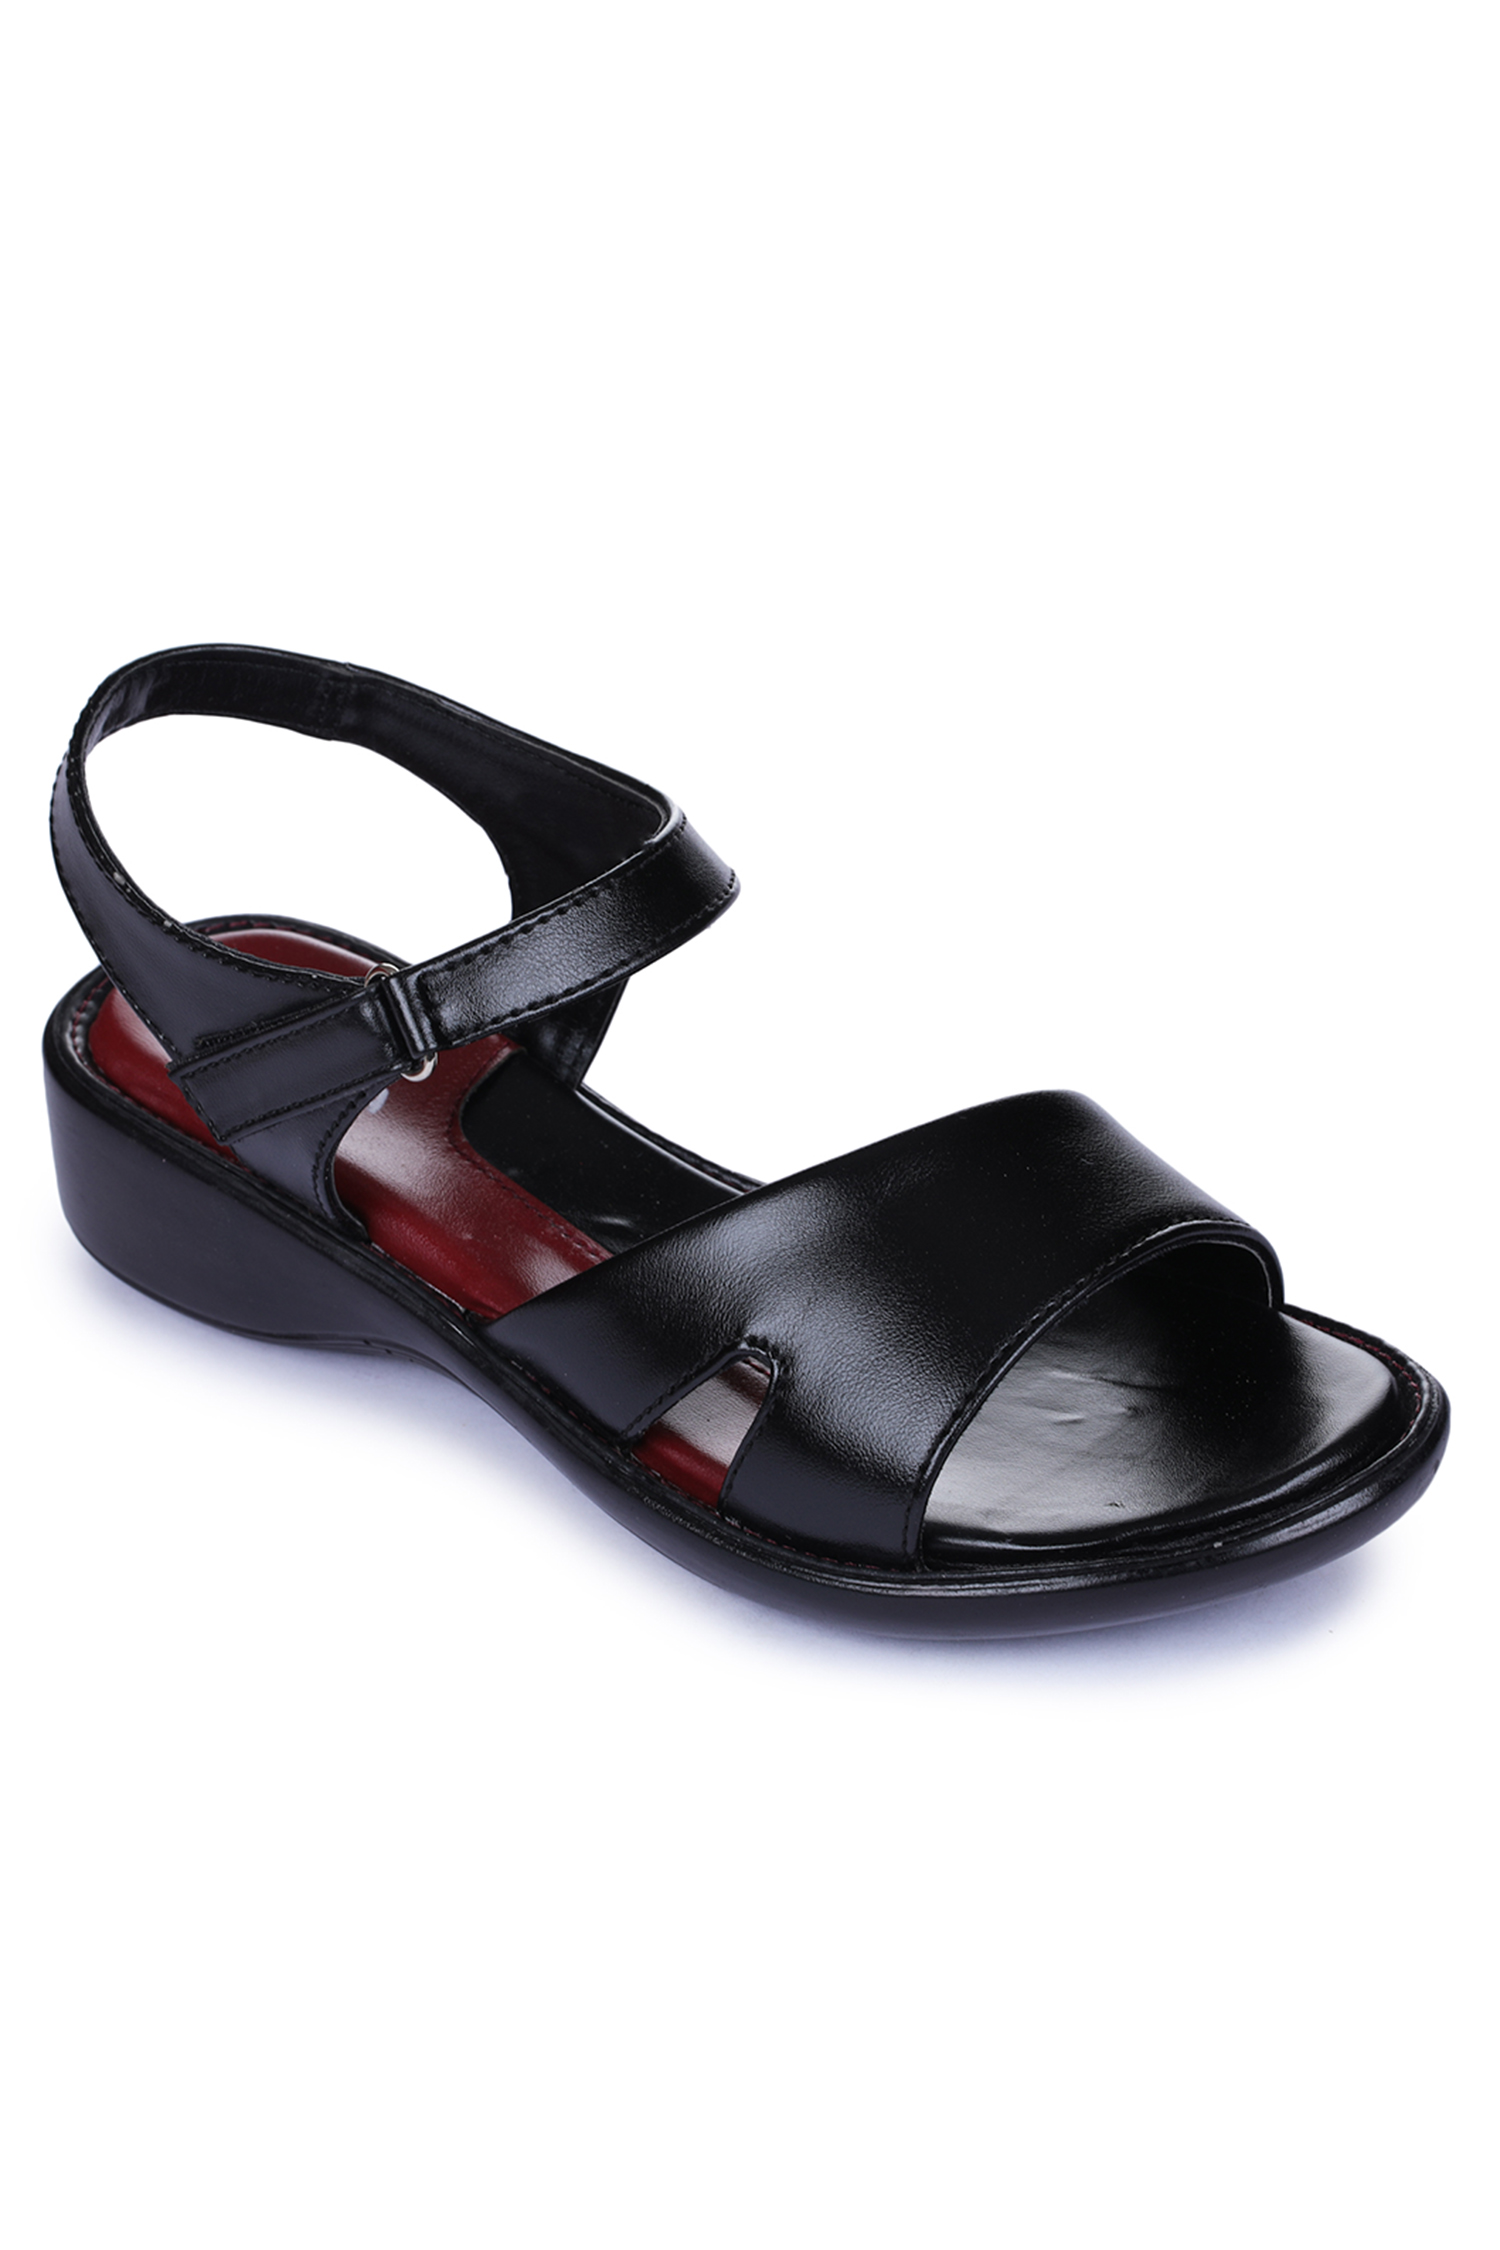 Liberty | Liberty SENORITA Sandals 345-07_BLACK For - Women